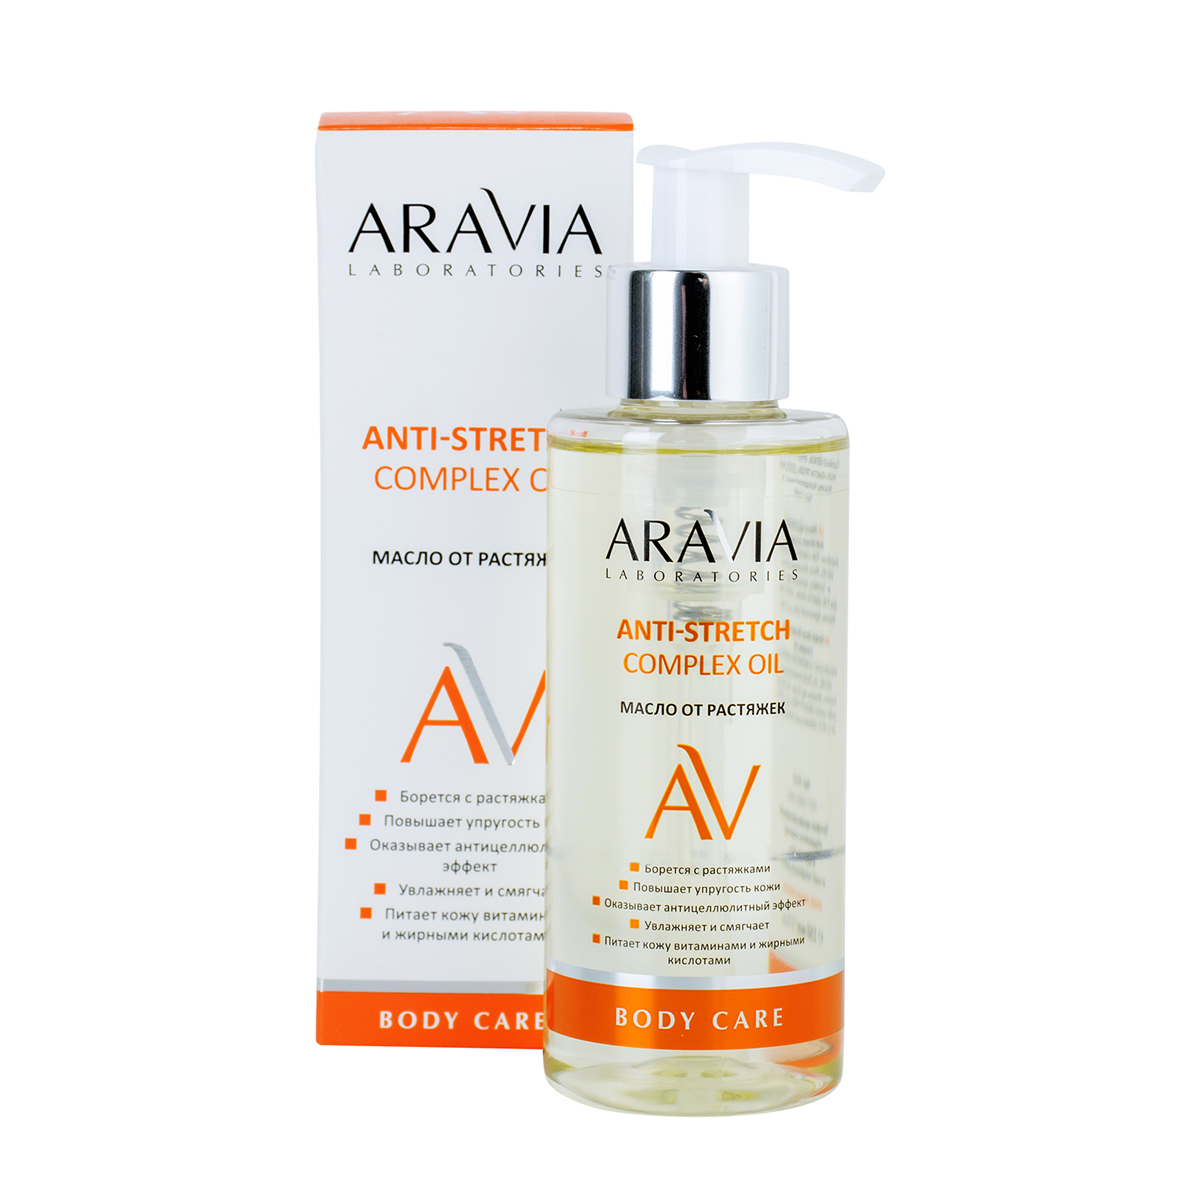 Aravia Laboratories Масло от растяжек Anti-Stretch Complex Oil, 150 мл (Aravia Laboratories, Уход за телом)